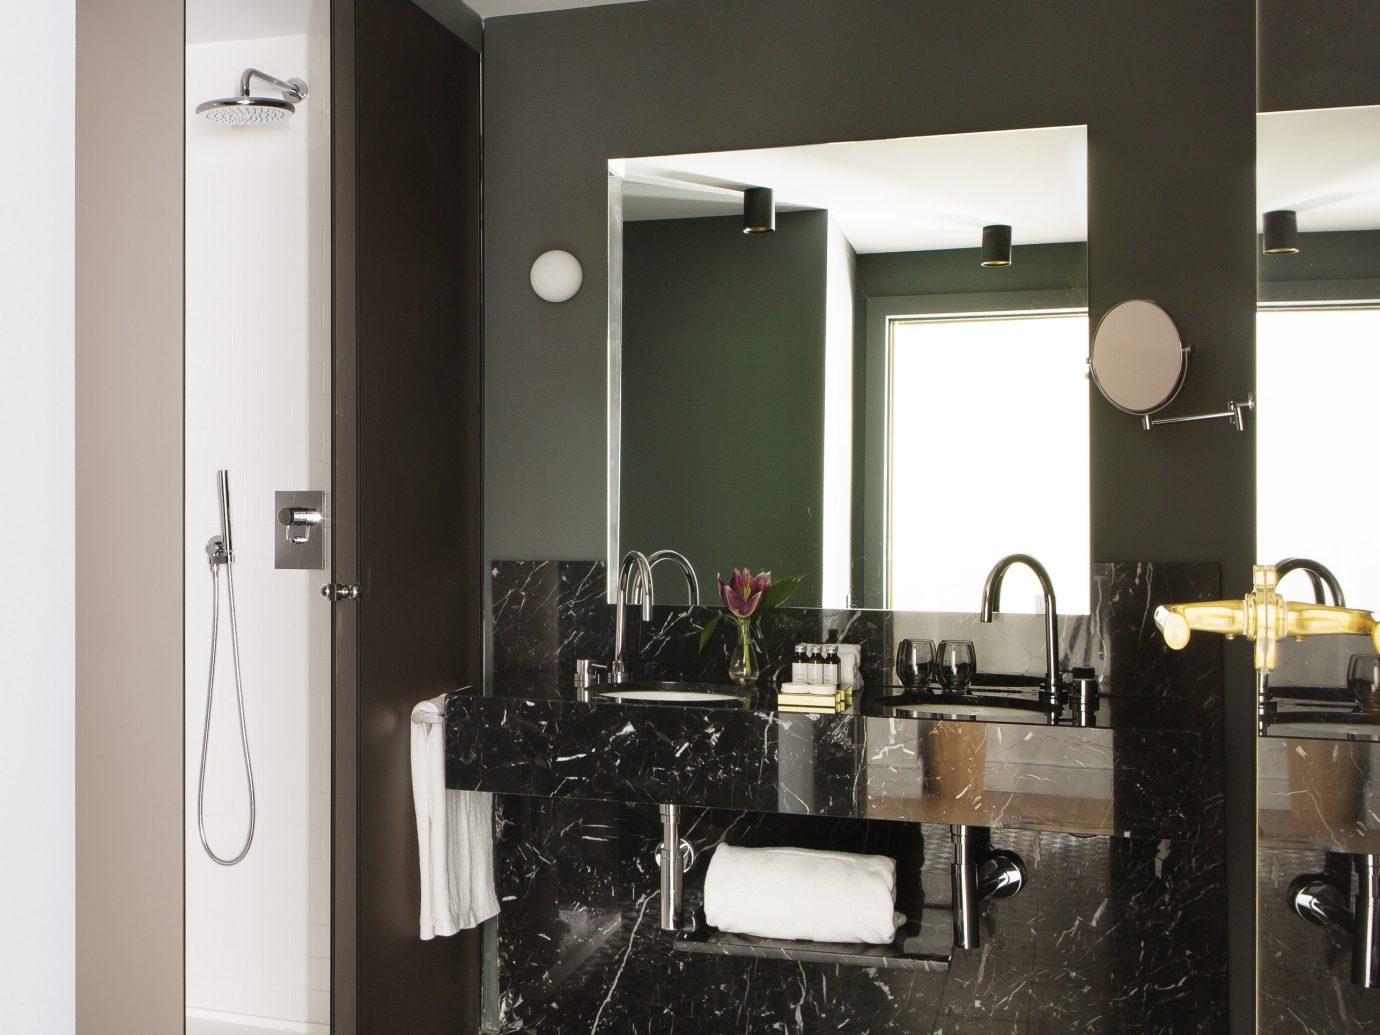 Hotels Madrid Spain wall indoor room property black furniture floor interior design cabinetry living room flooring